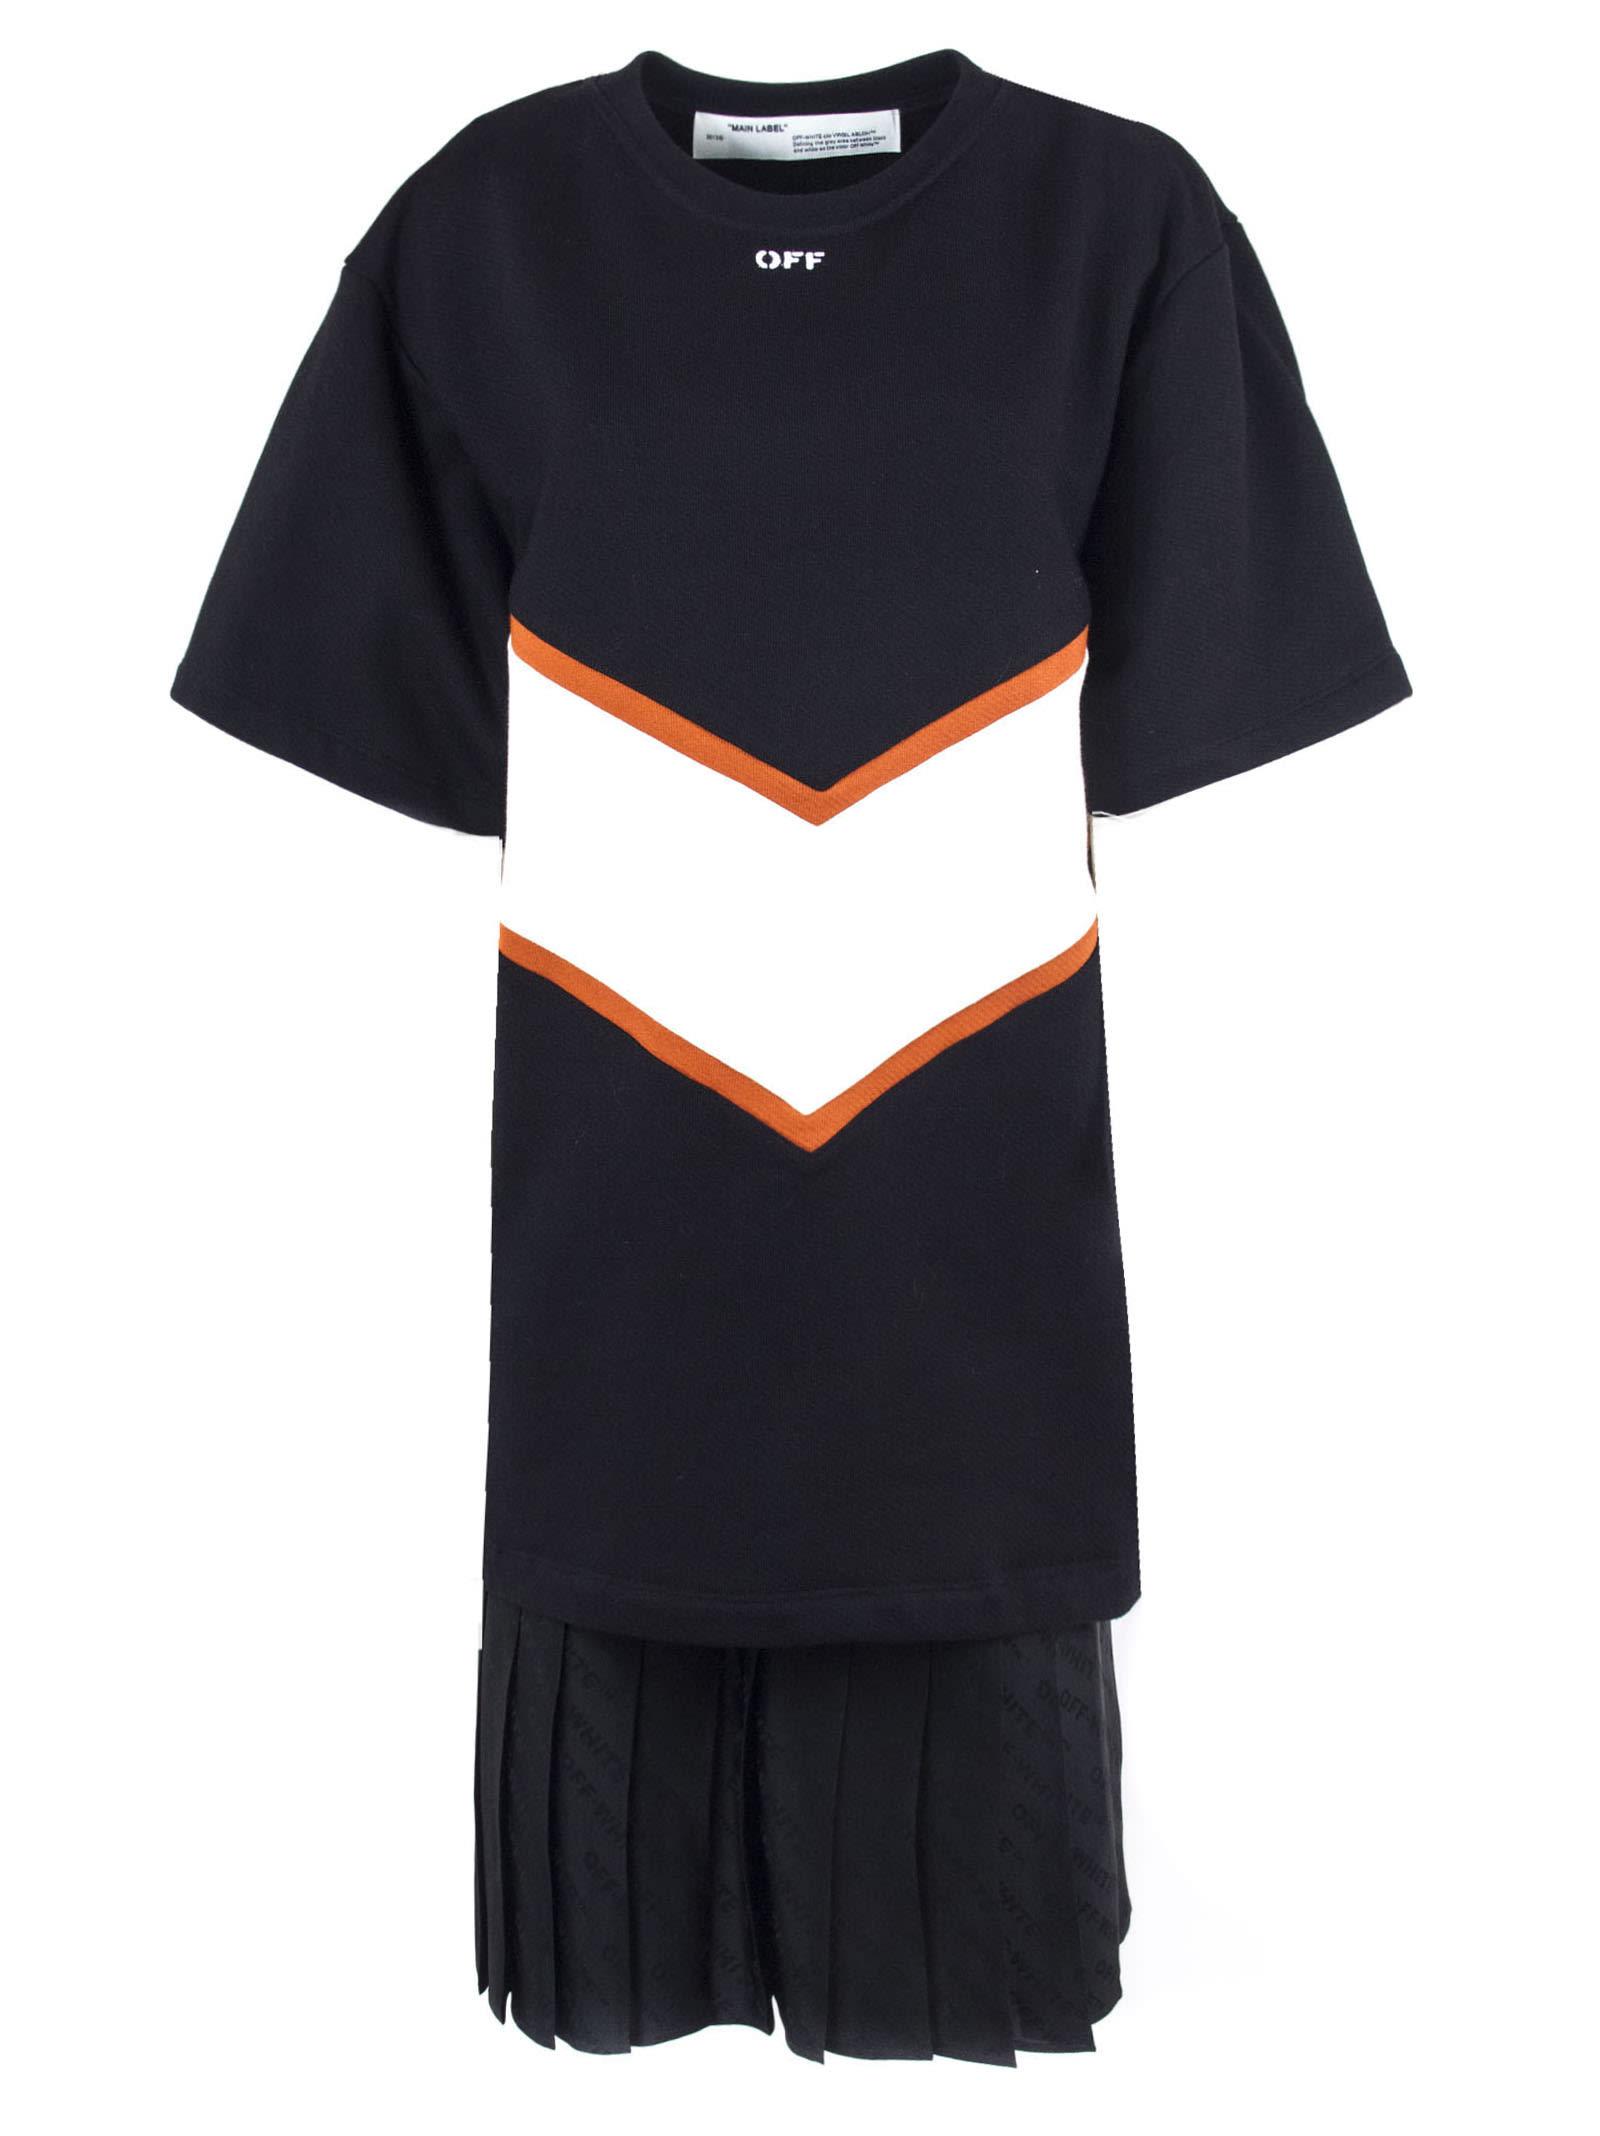 Off-White Black Intarsia Sweatshirt Dress